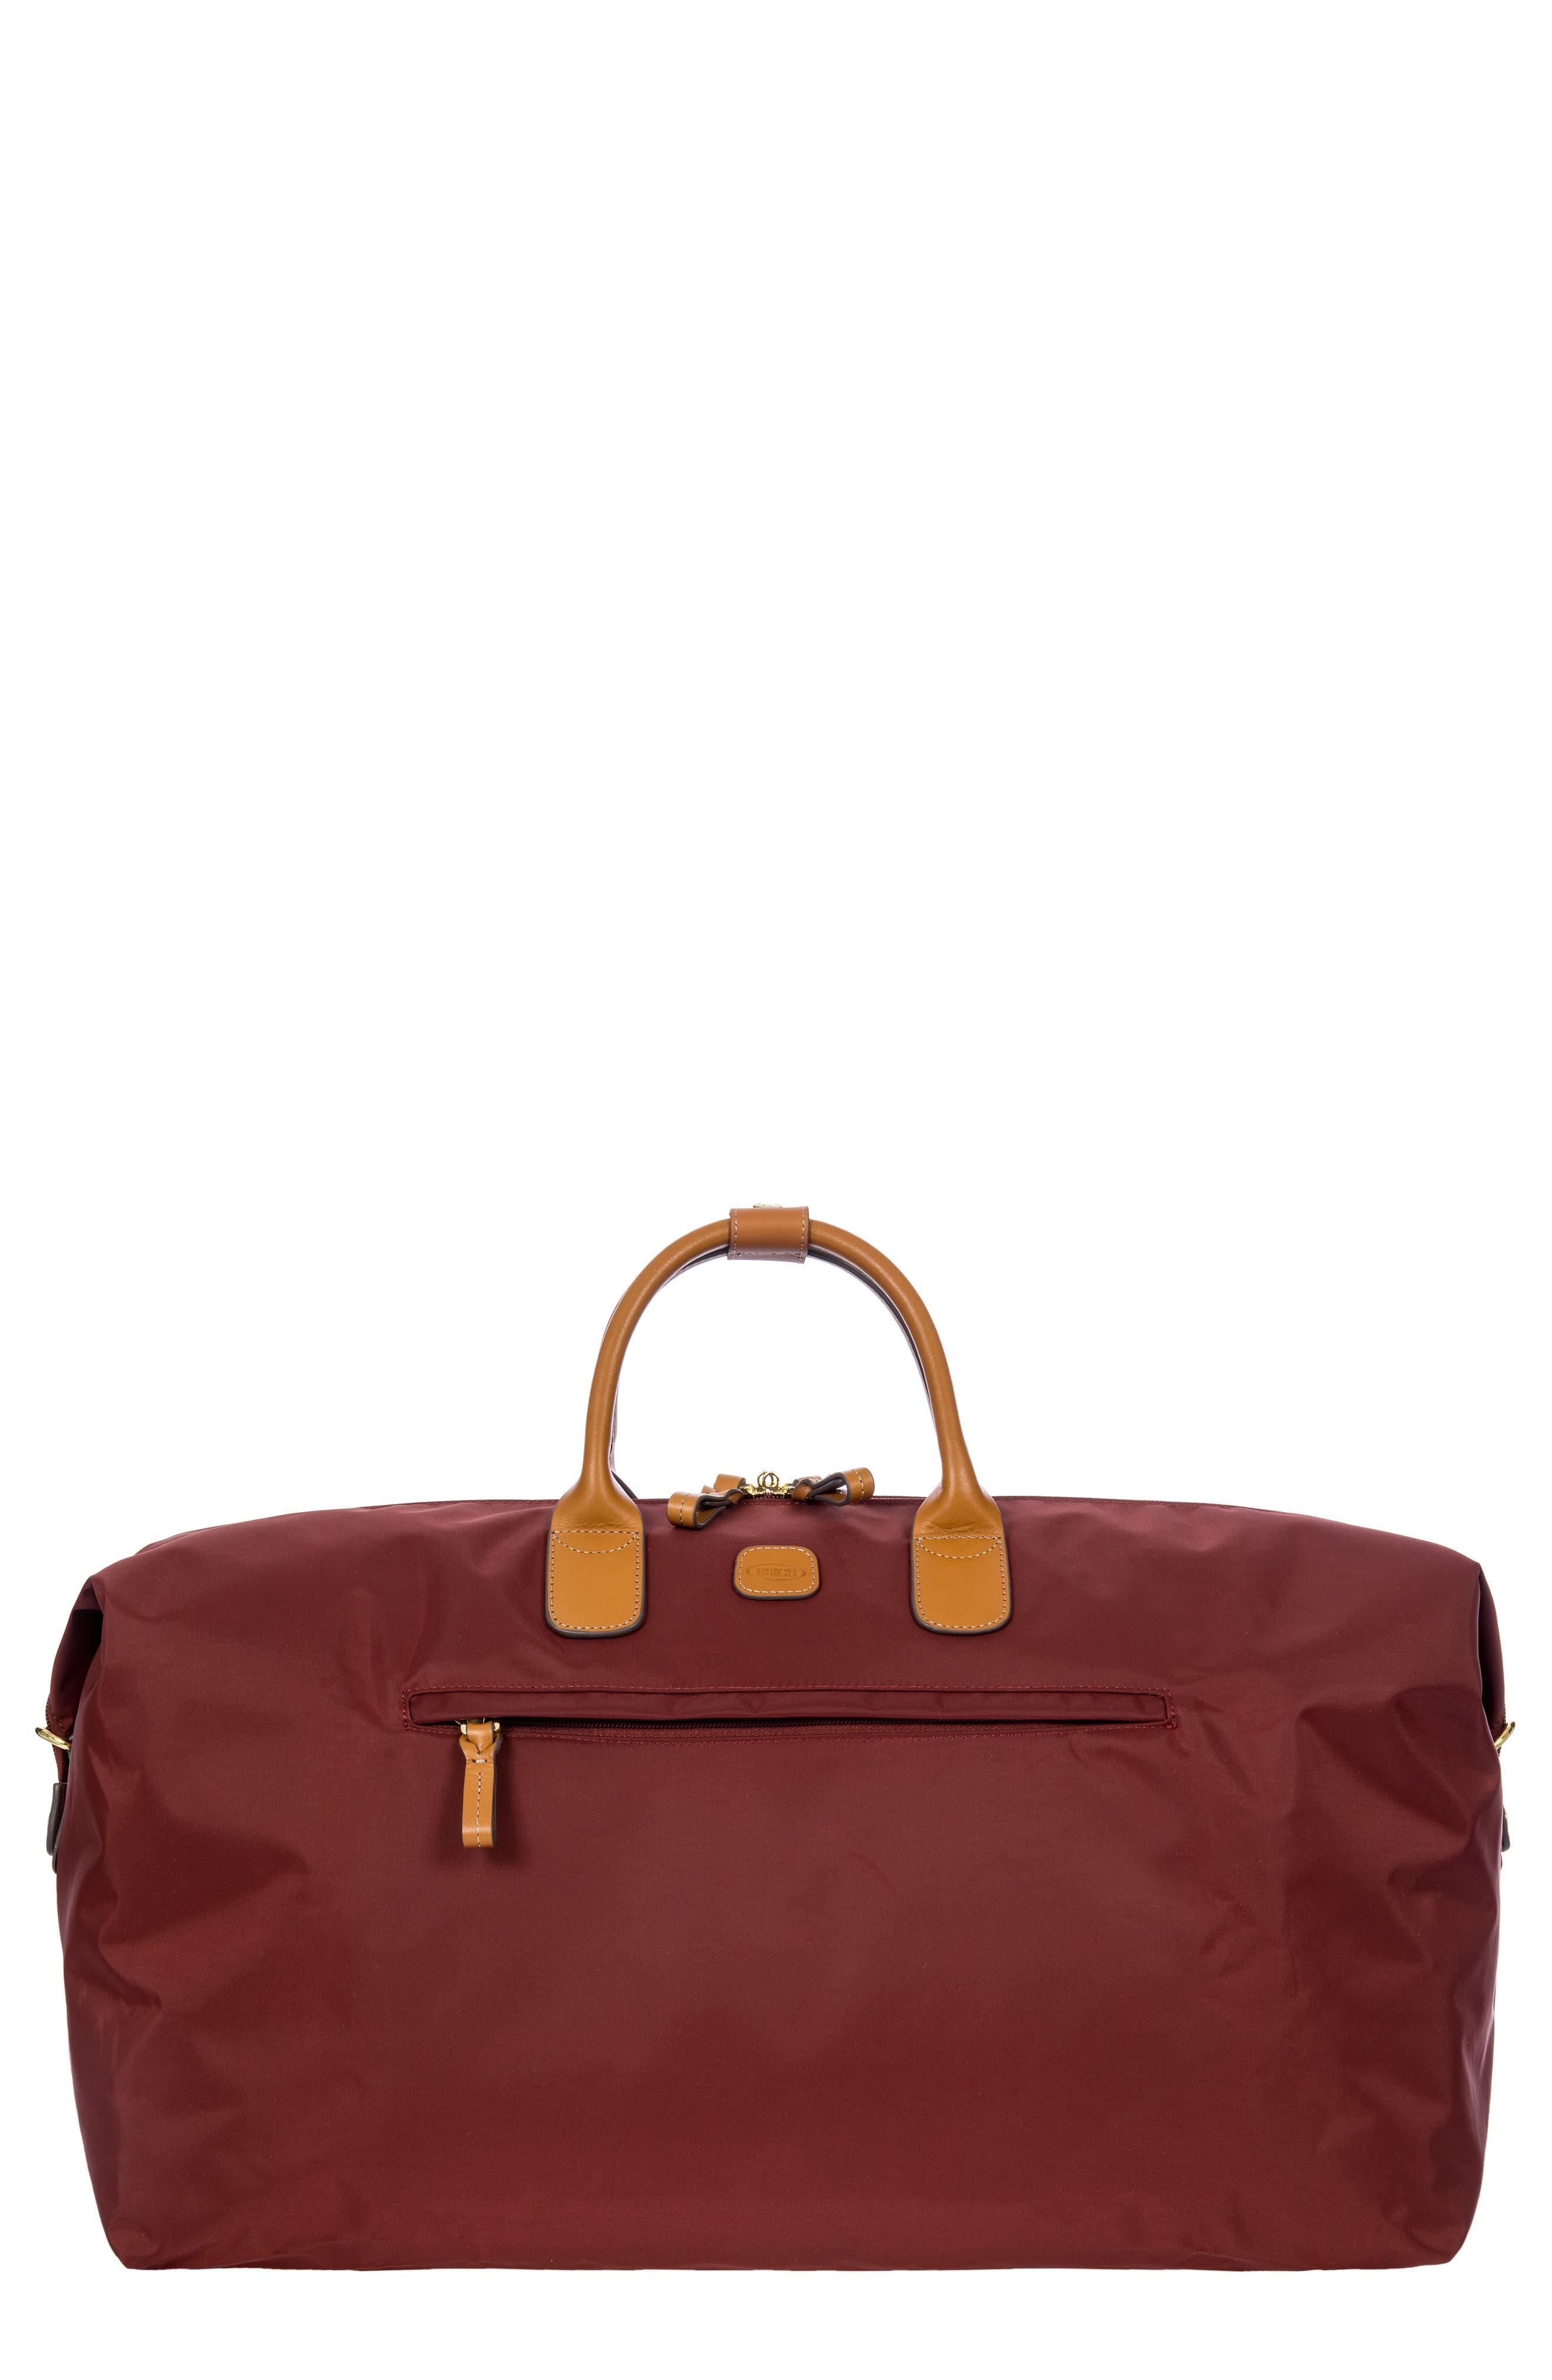 Bric's X-Bag Boarding 22-Inch Duffle Bag - Burgundy